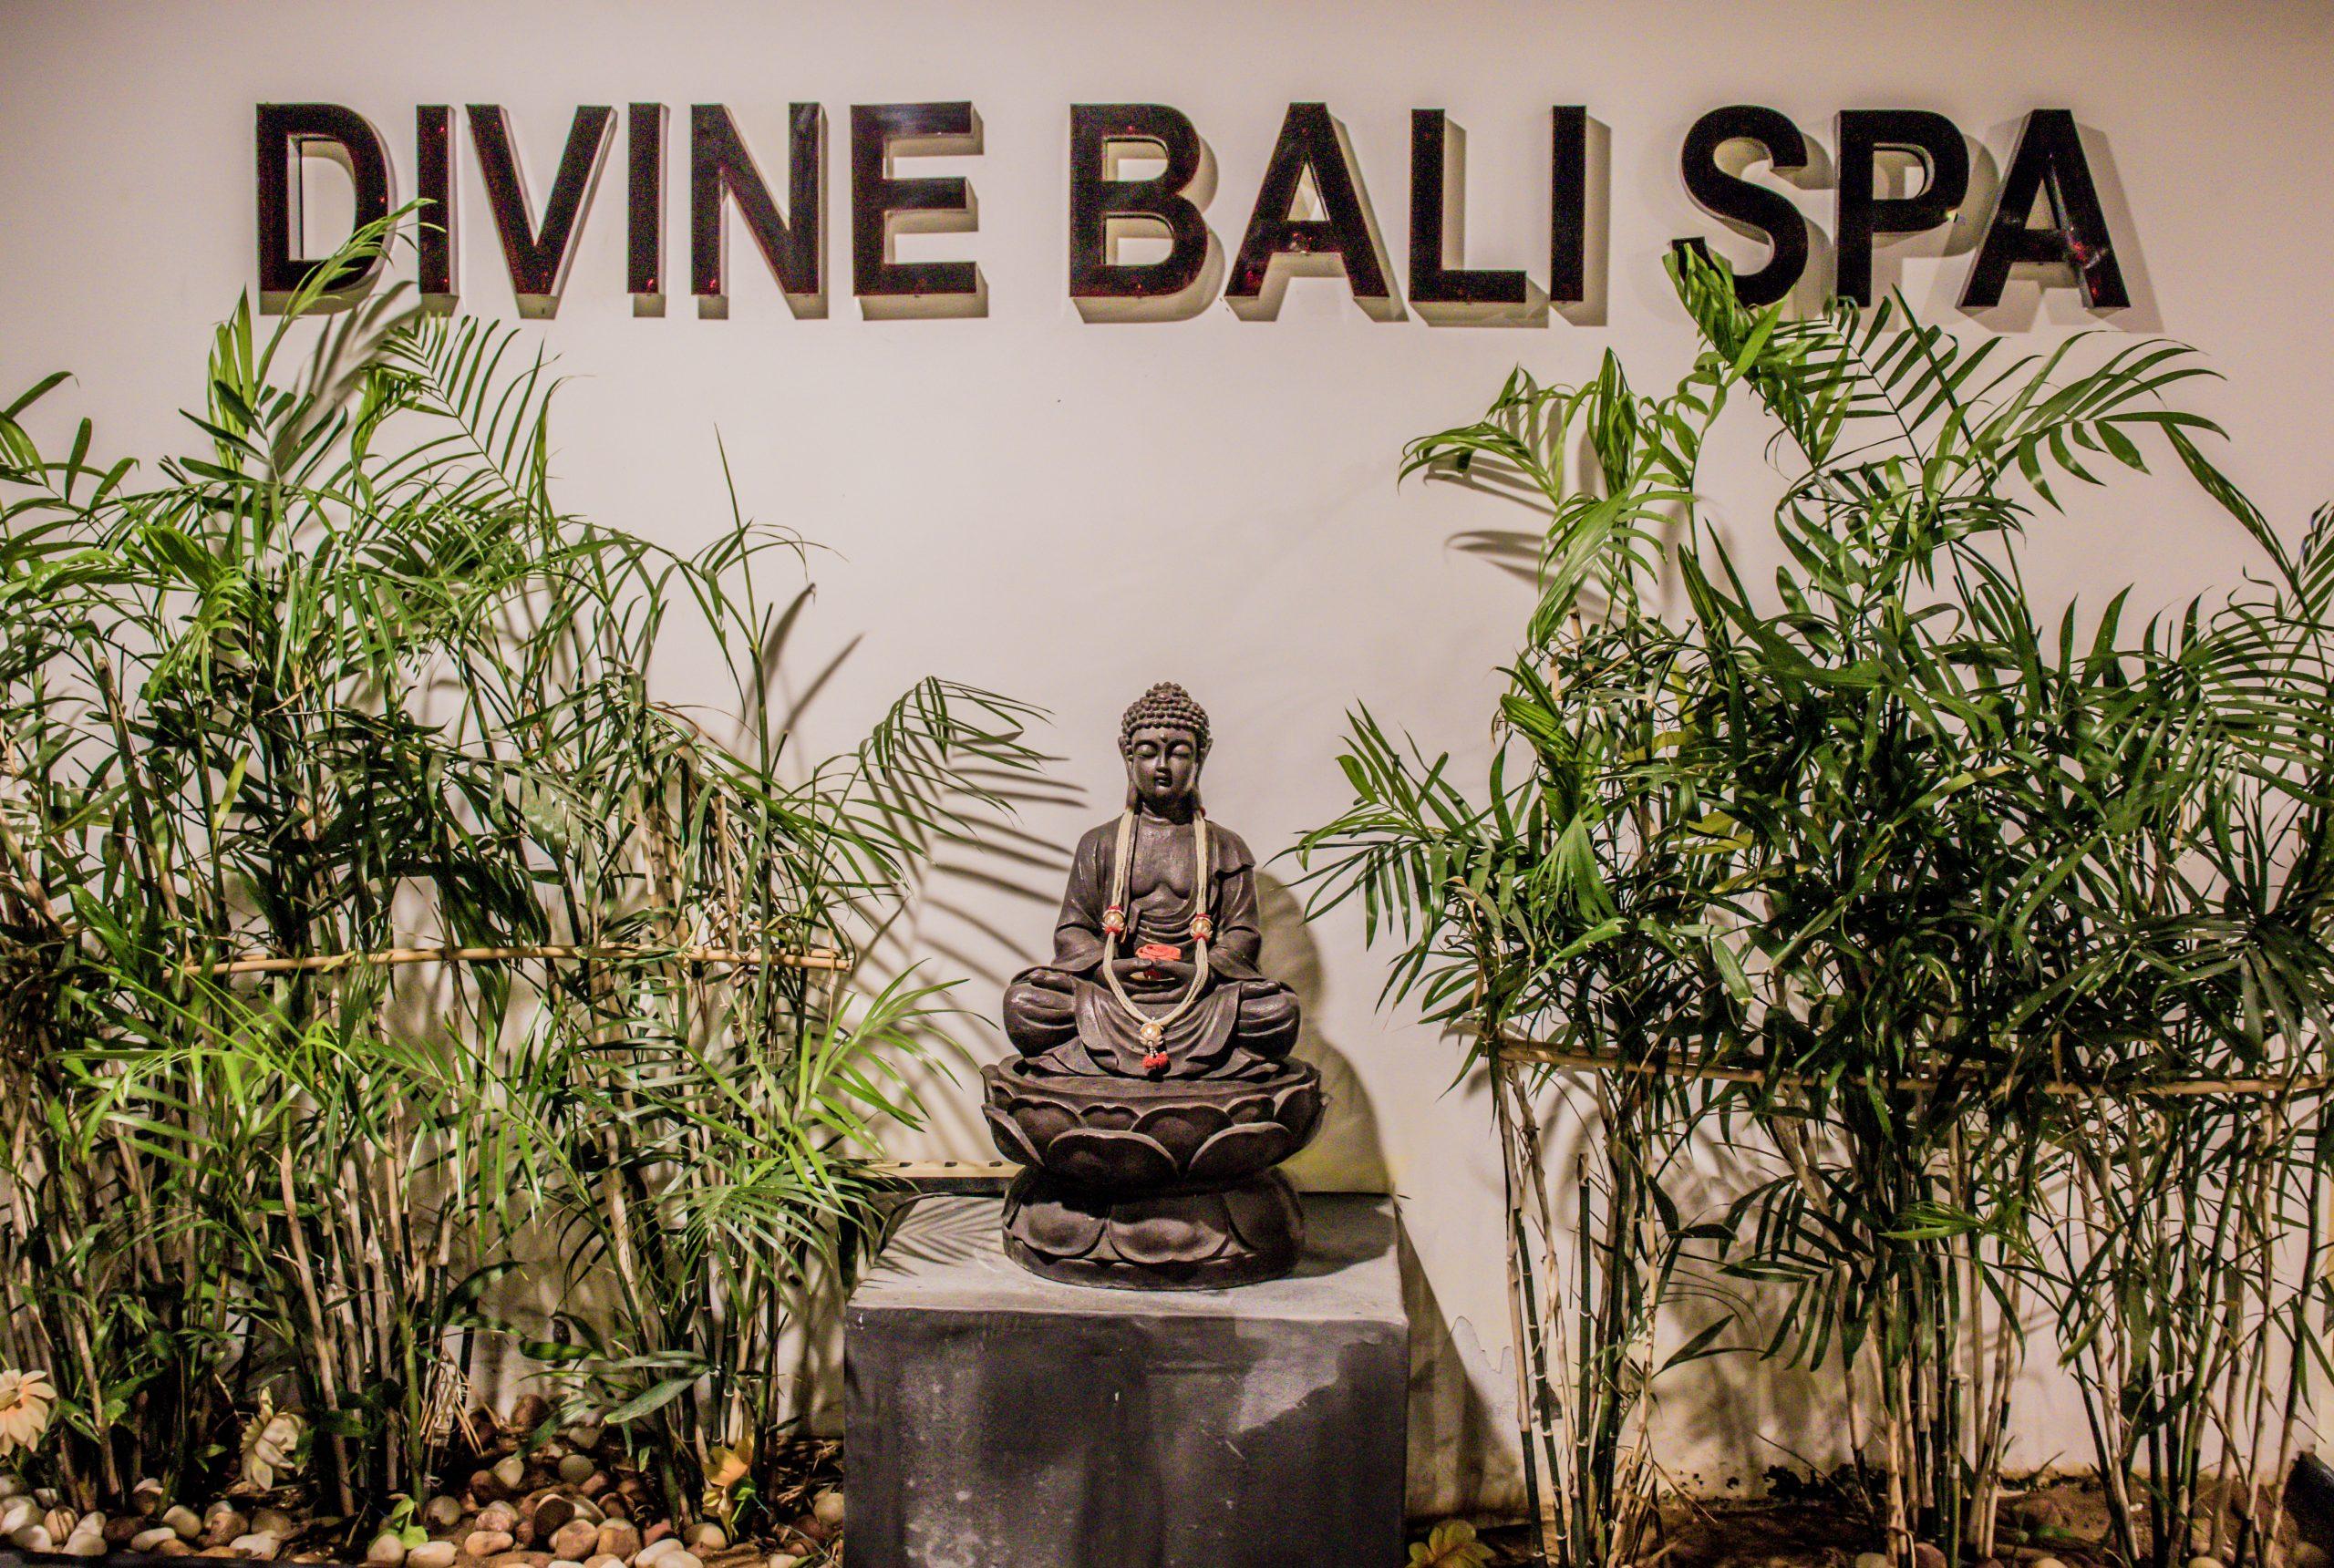 A buddha statue